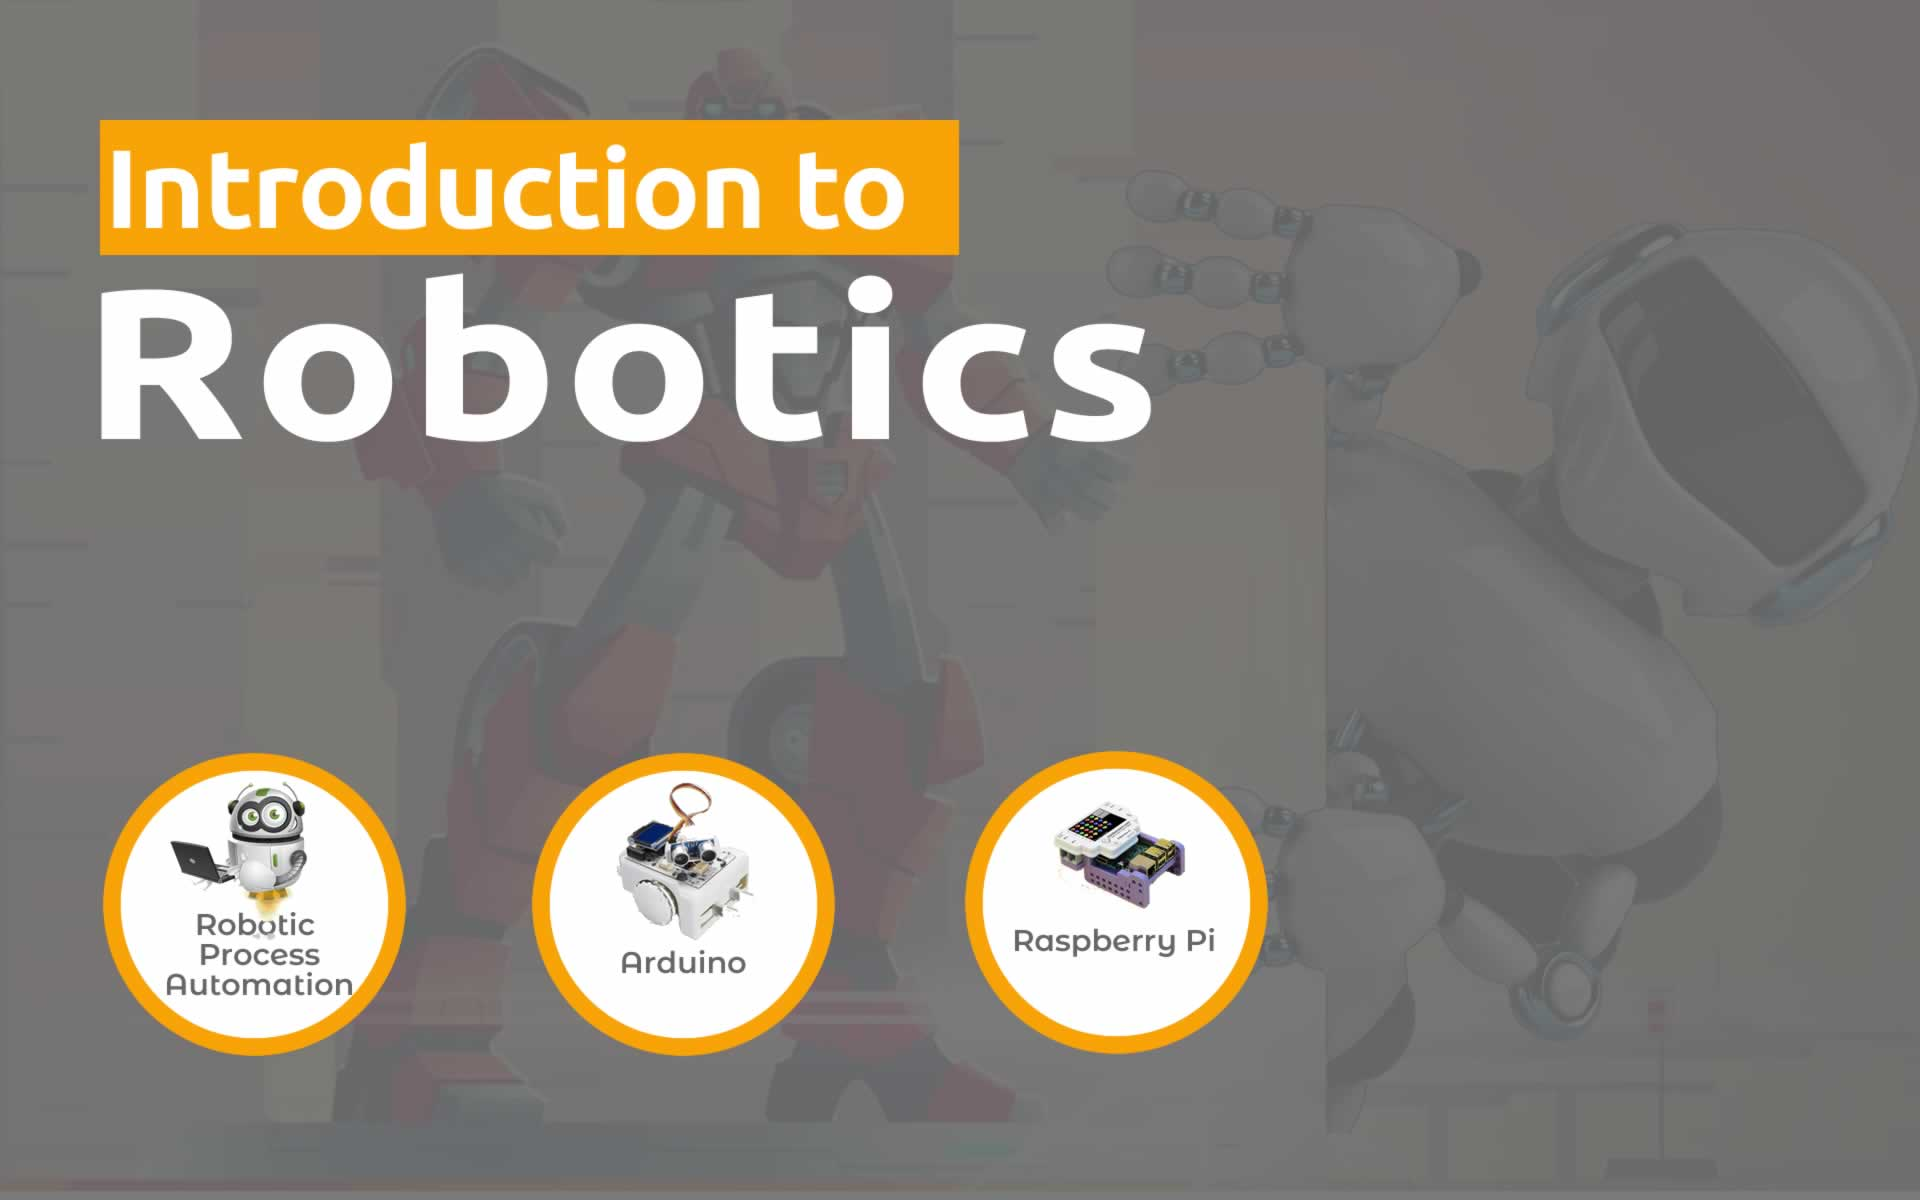 Robotics| Age 10-19 (Robotics Process Automation +Arduino +Raspberry PI)